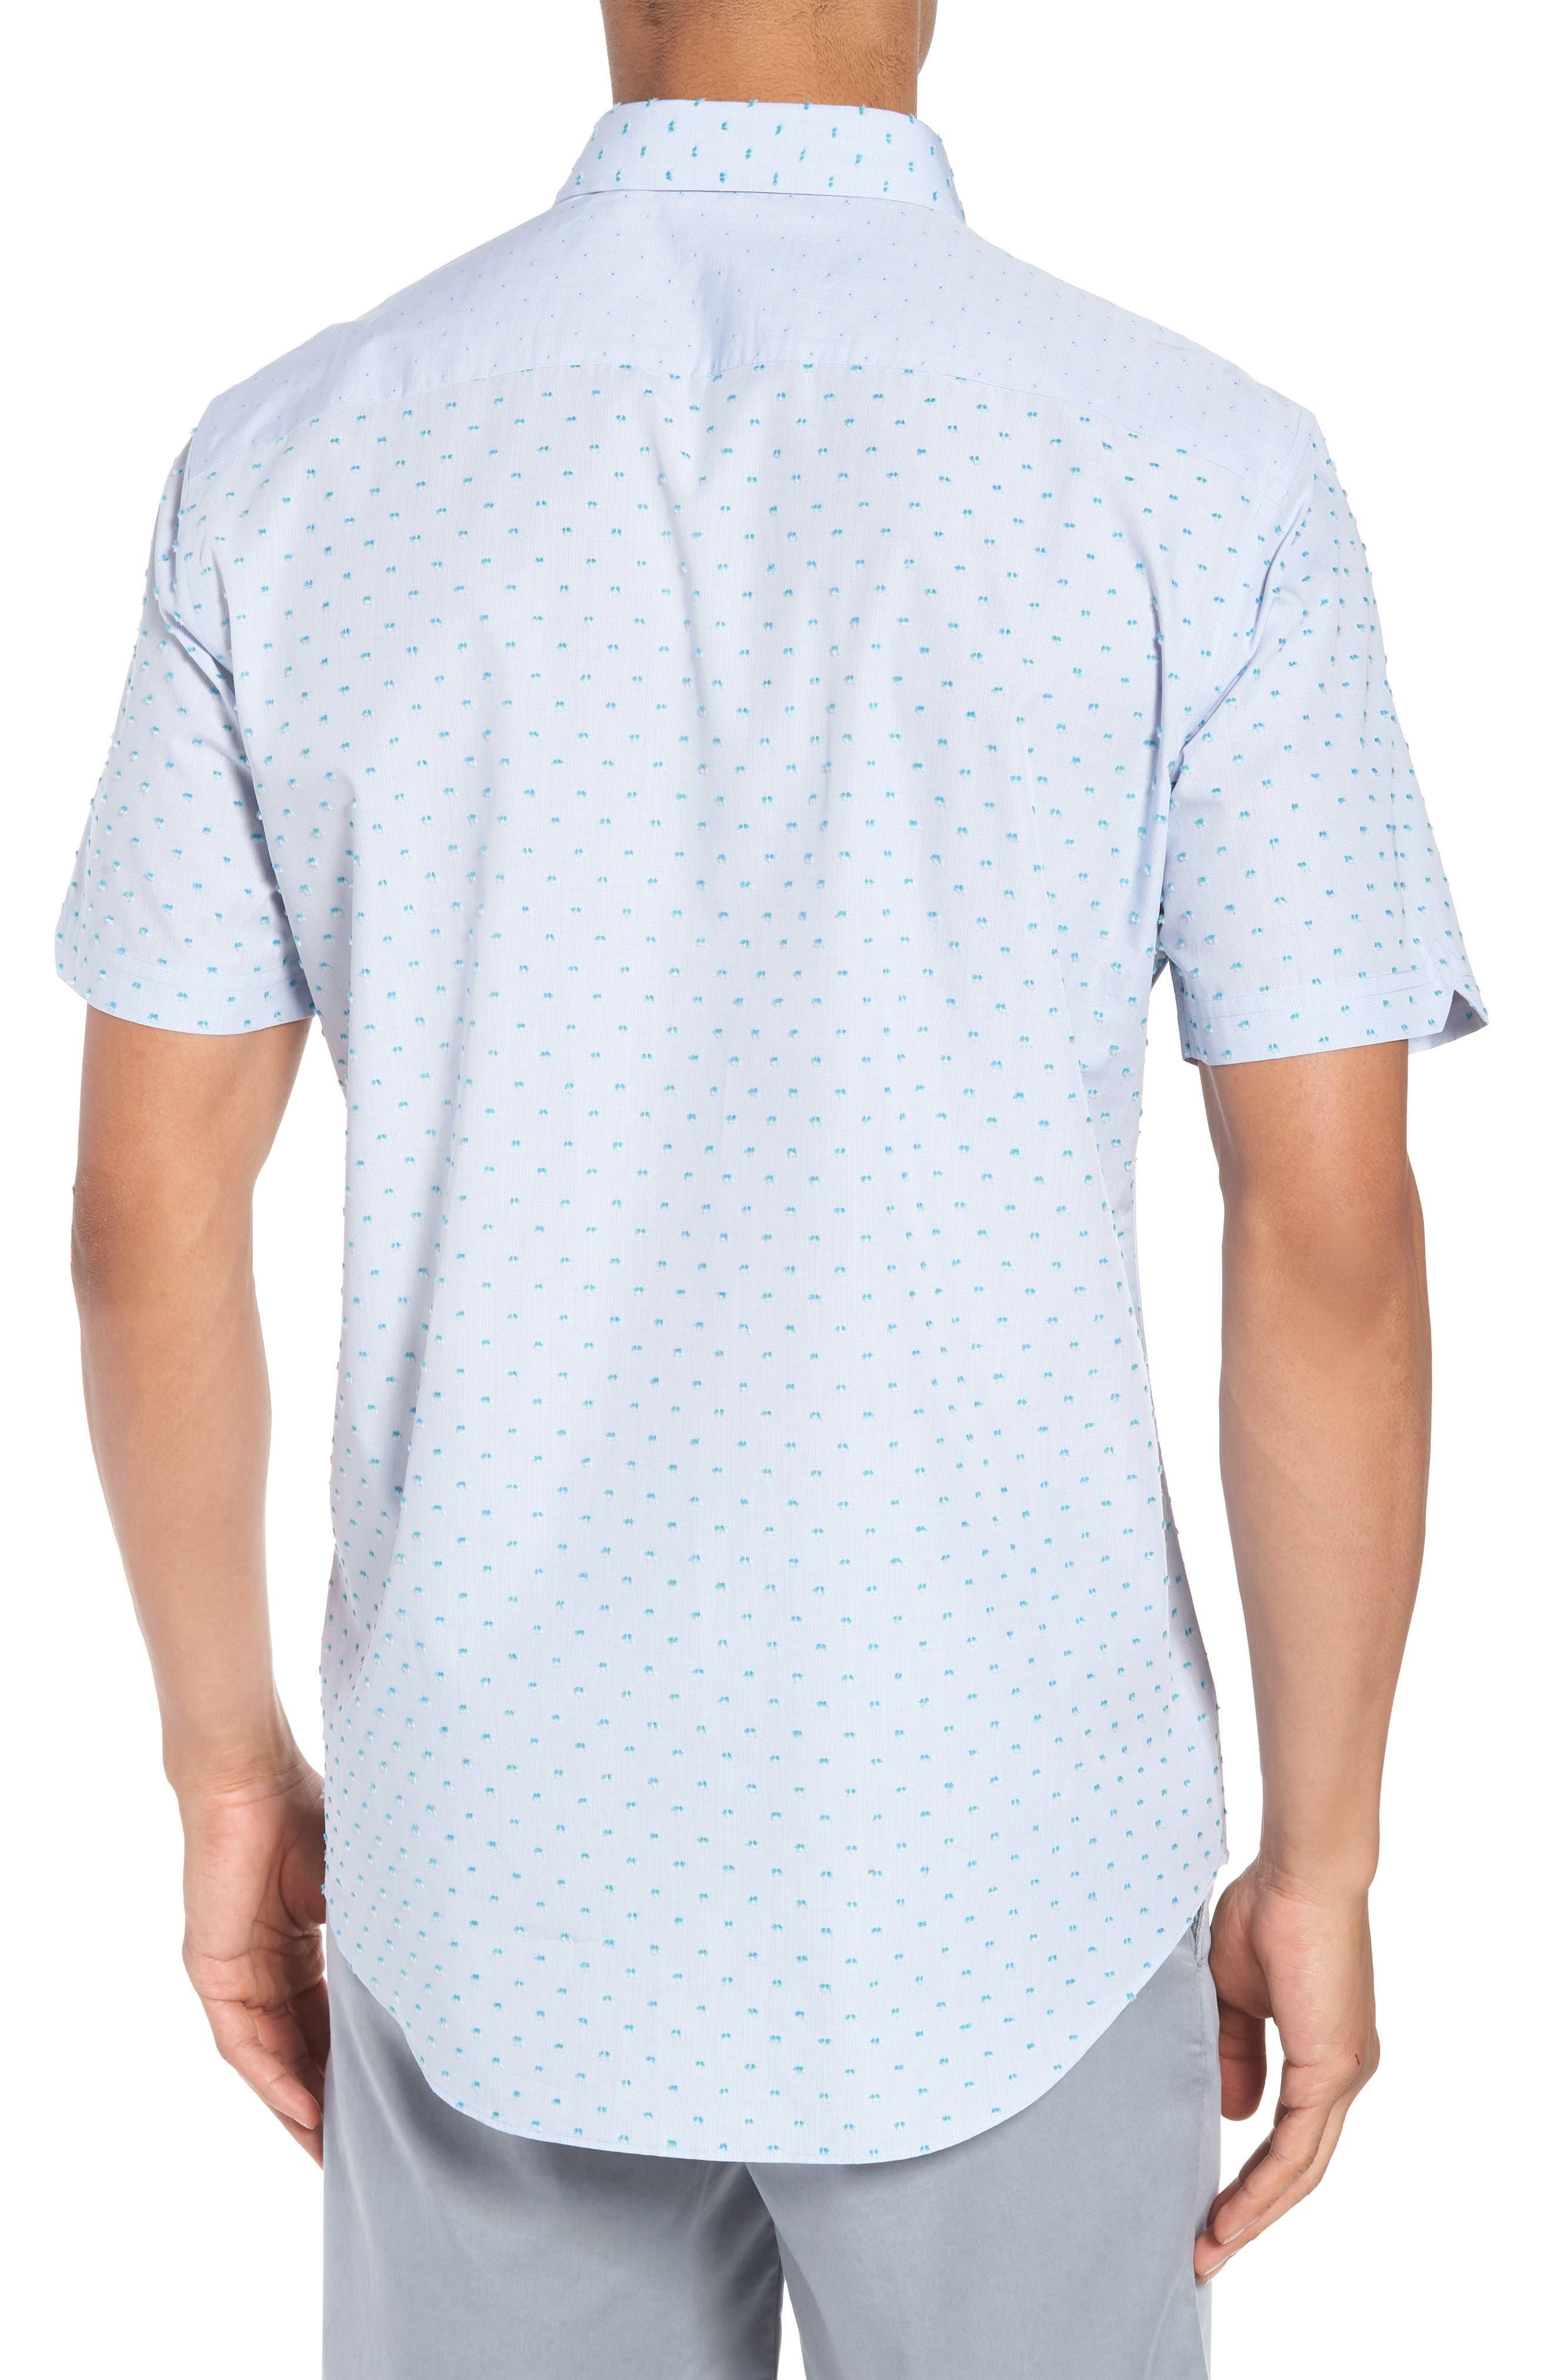 Dolle Fil a Coupe Sport Shirt,                             Alternate thumbnail 2, color,                             Light Blue